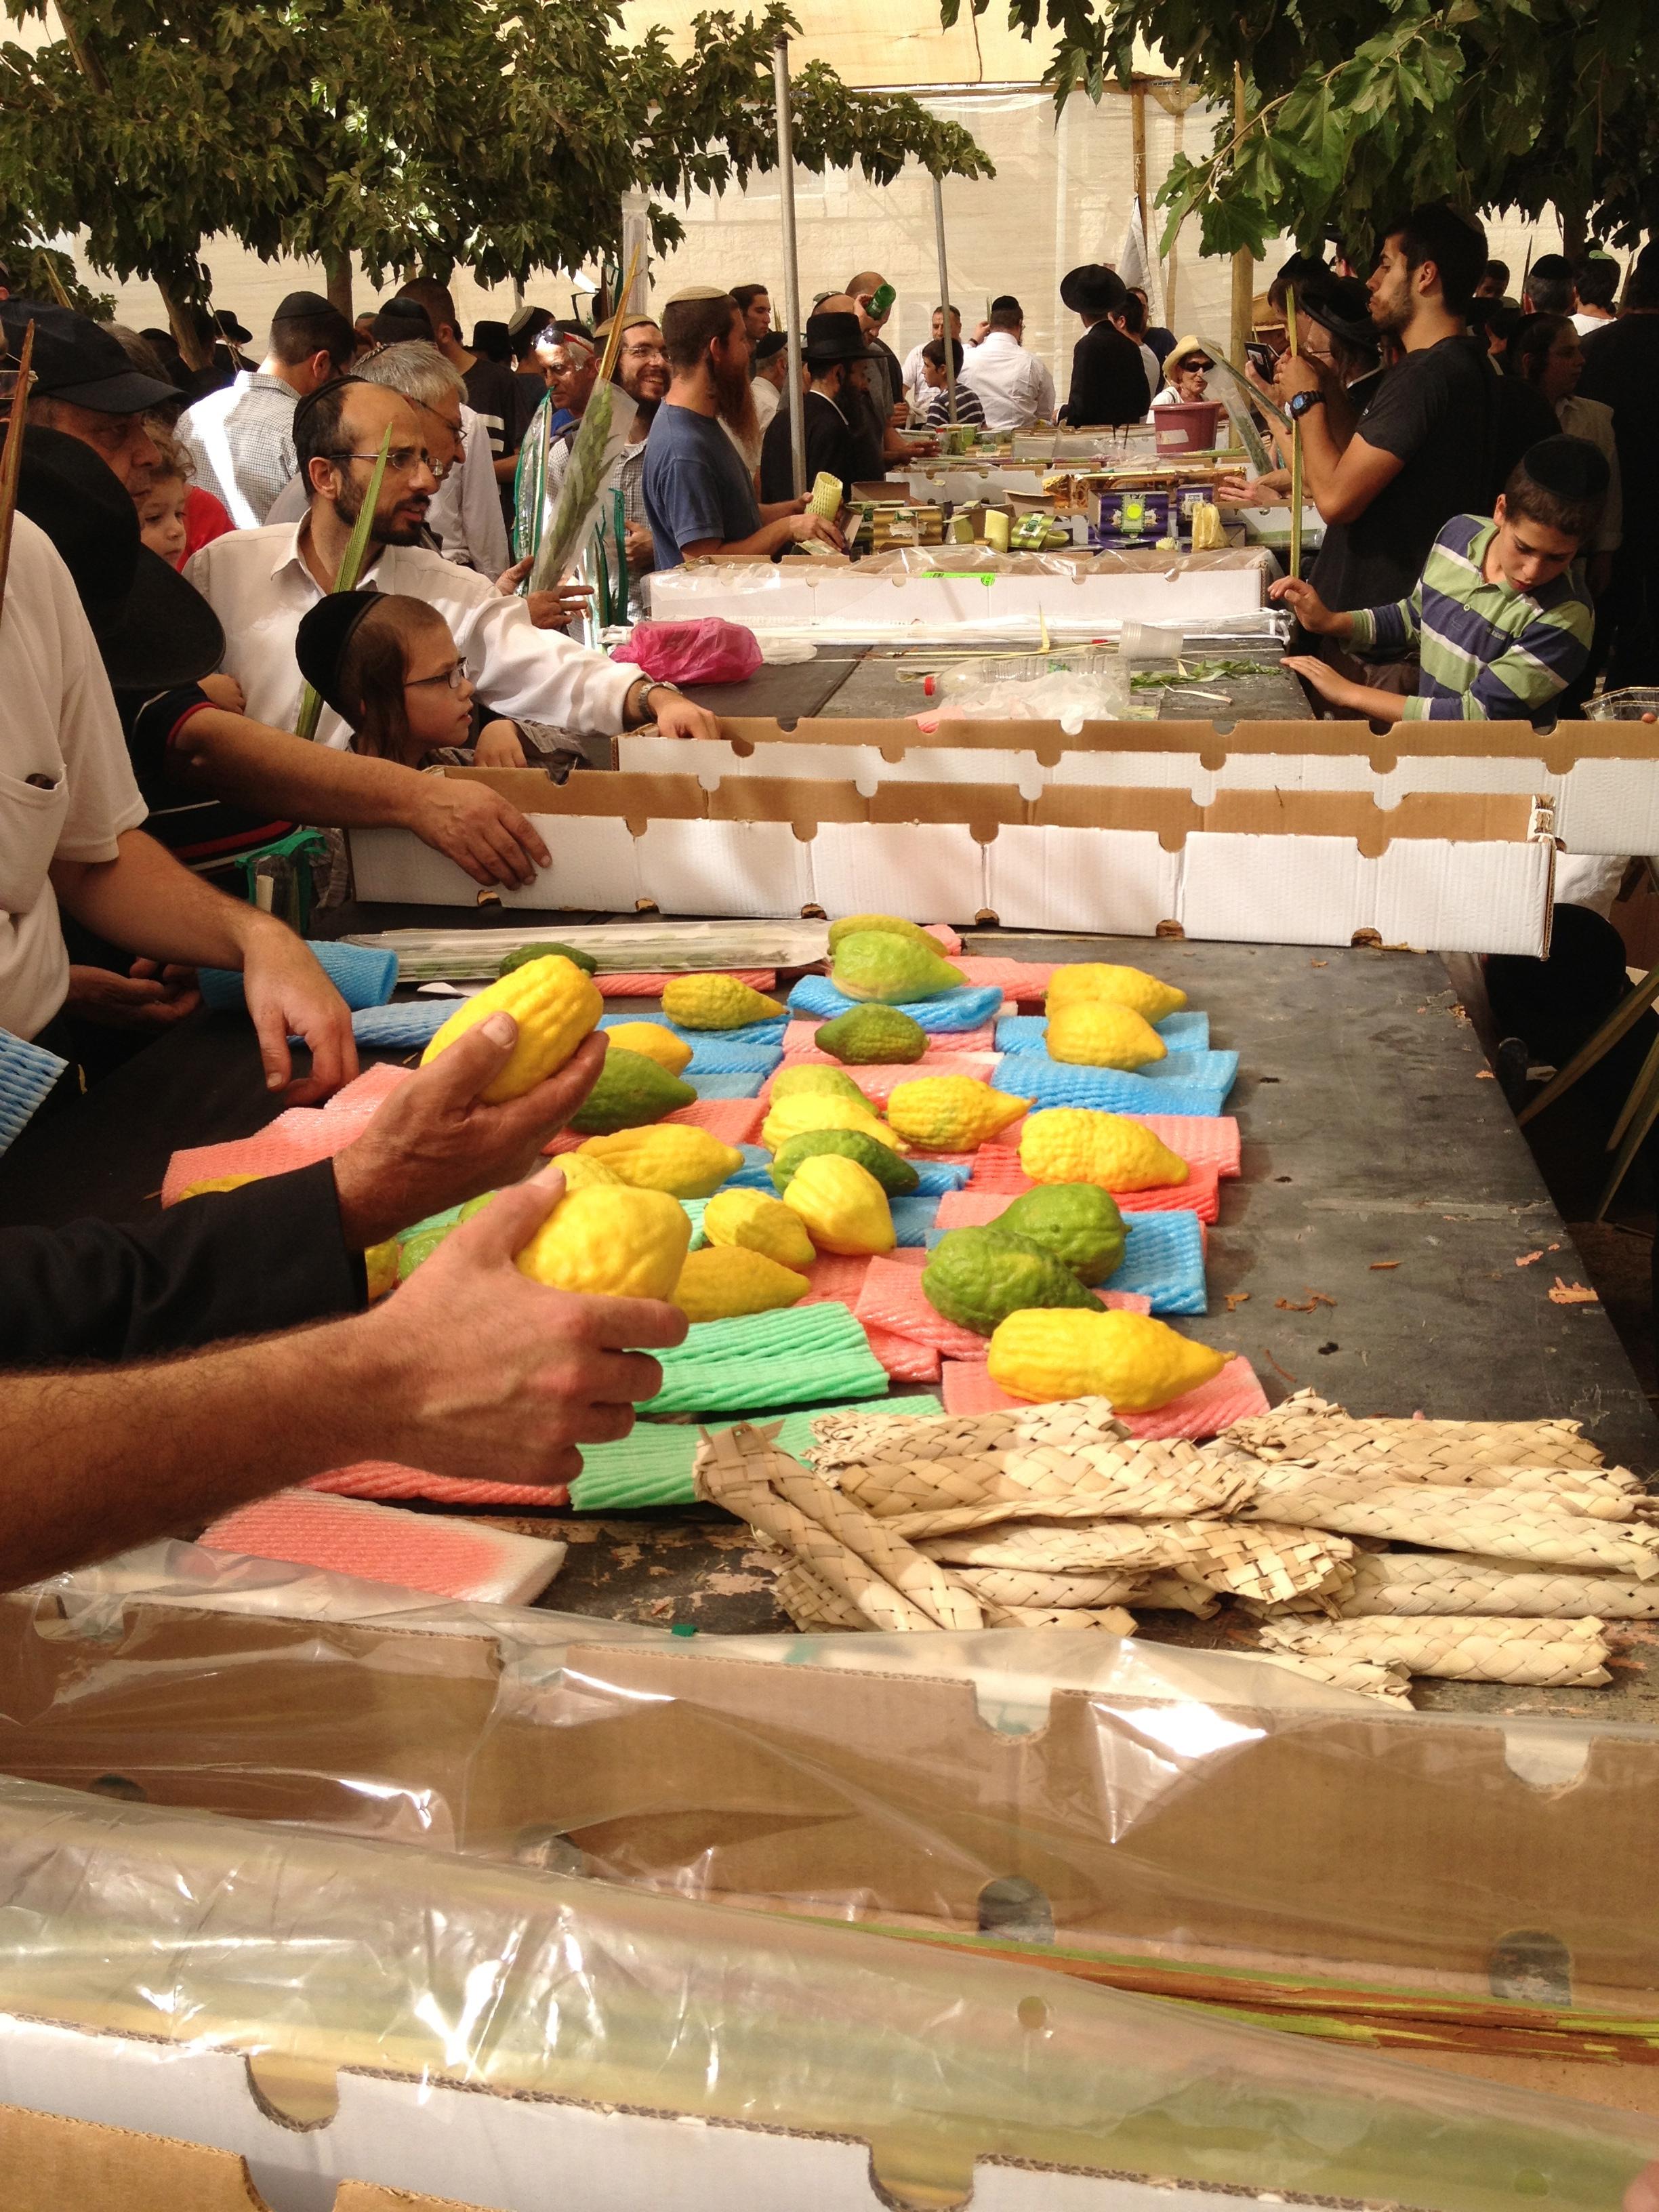 Jerusalem Sukkot Market #JewishFoodieForever #TBT @amhromadka